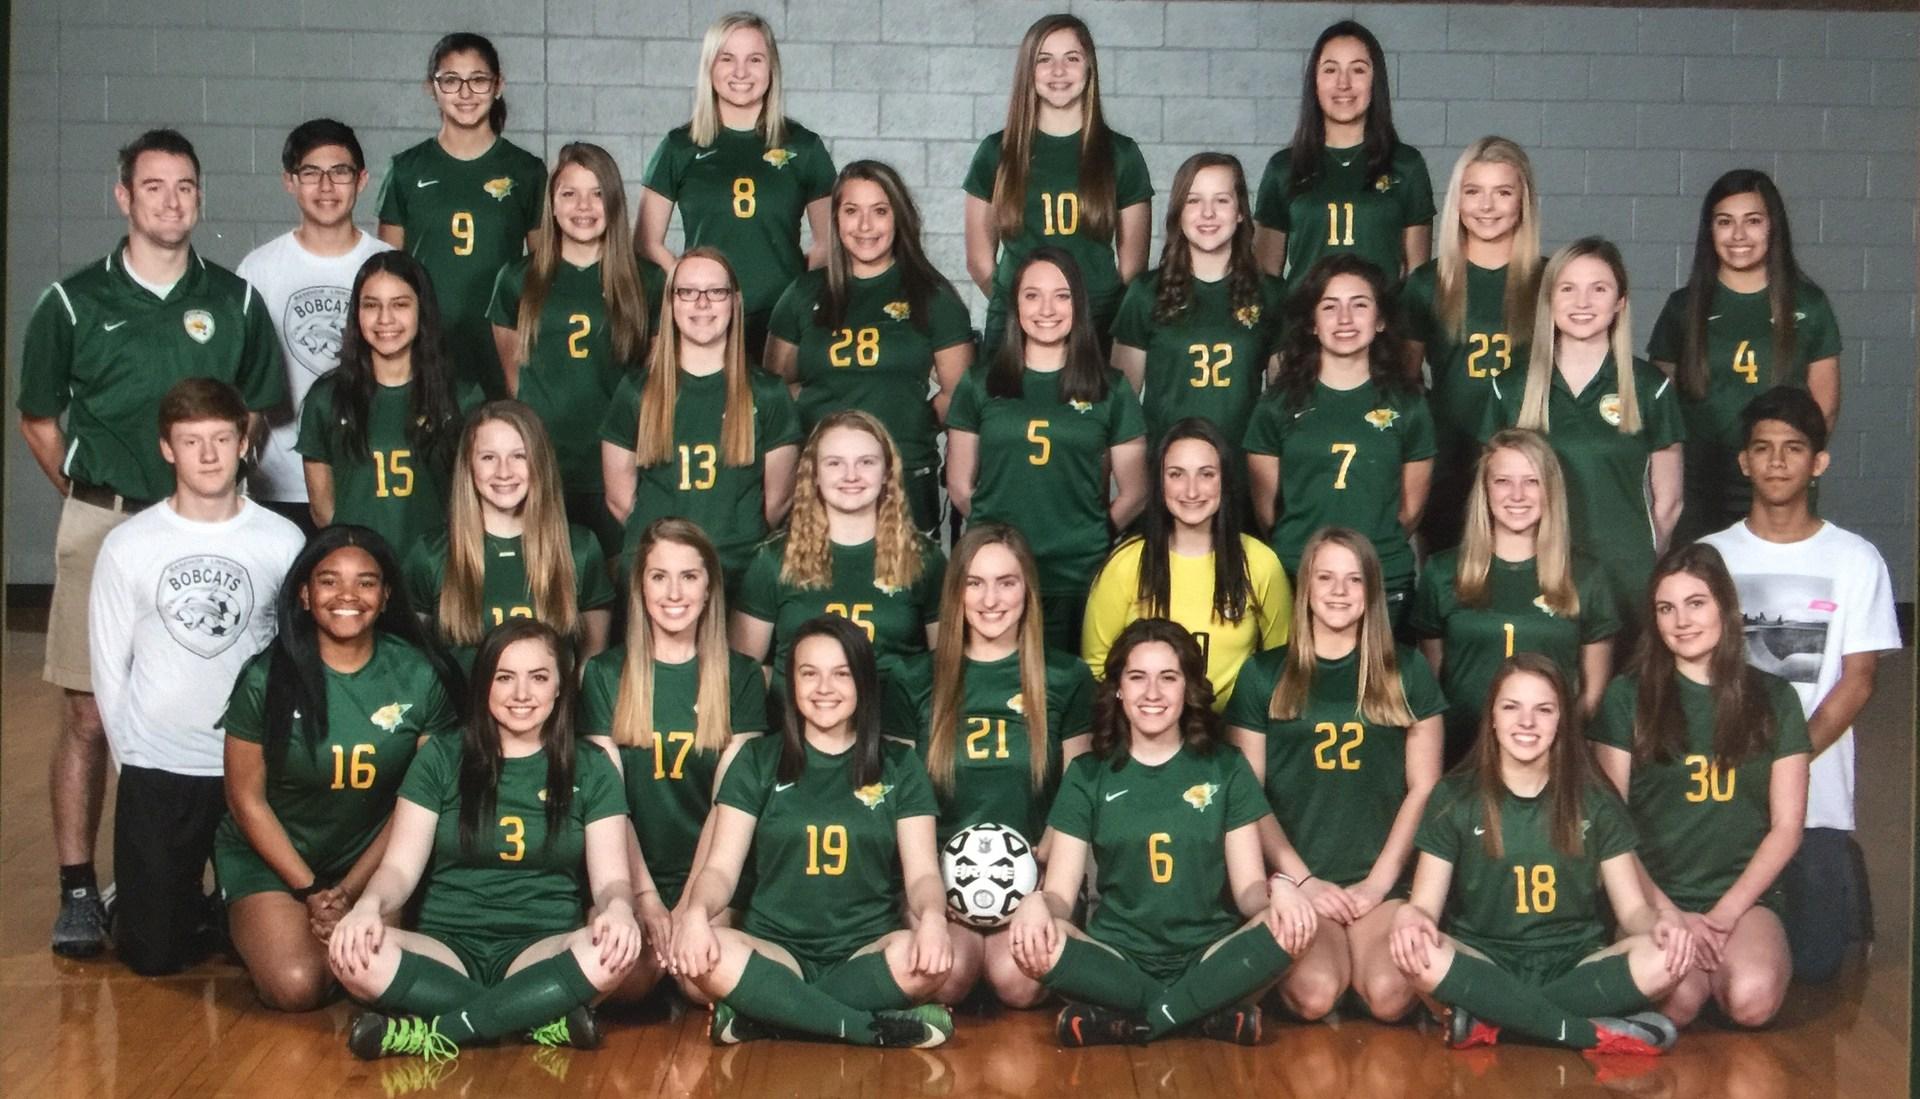 2018 Girls Team Photo